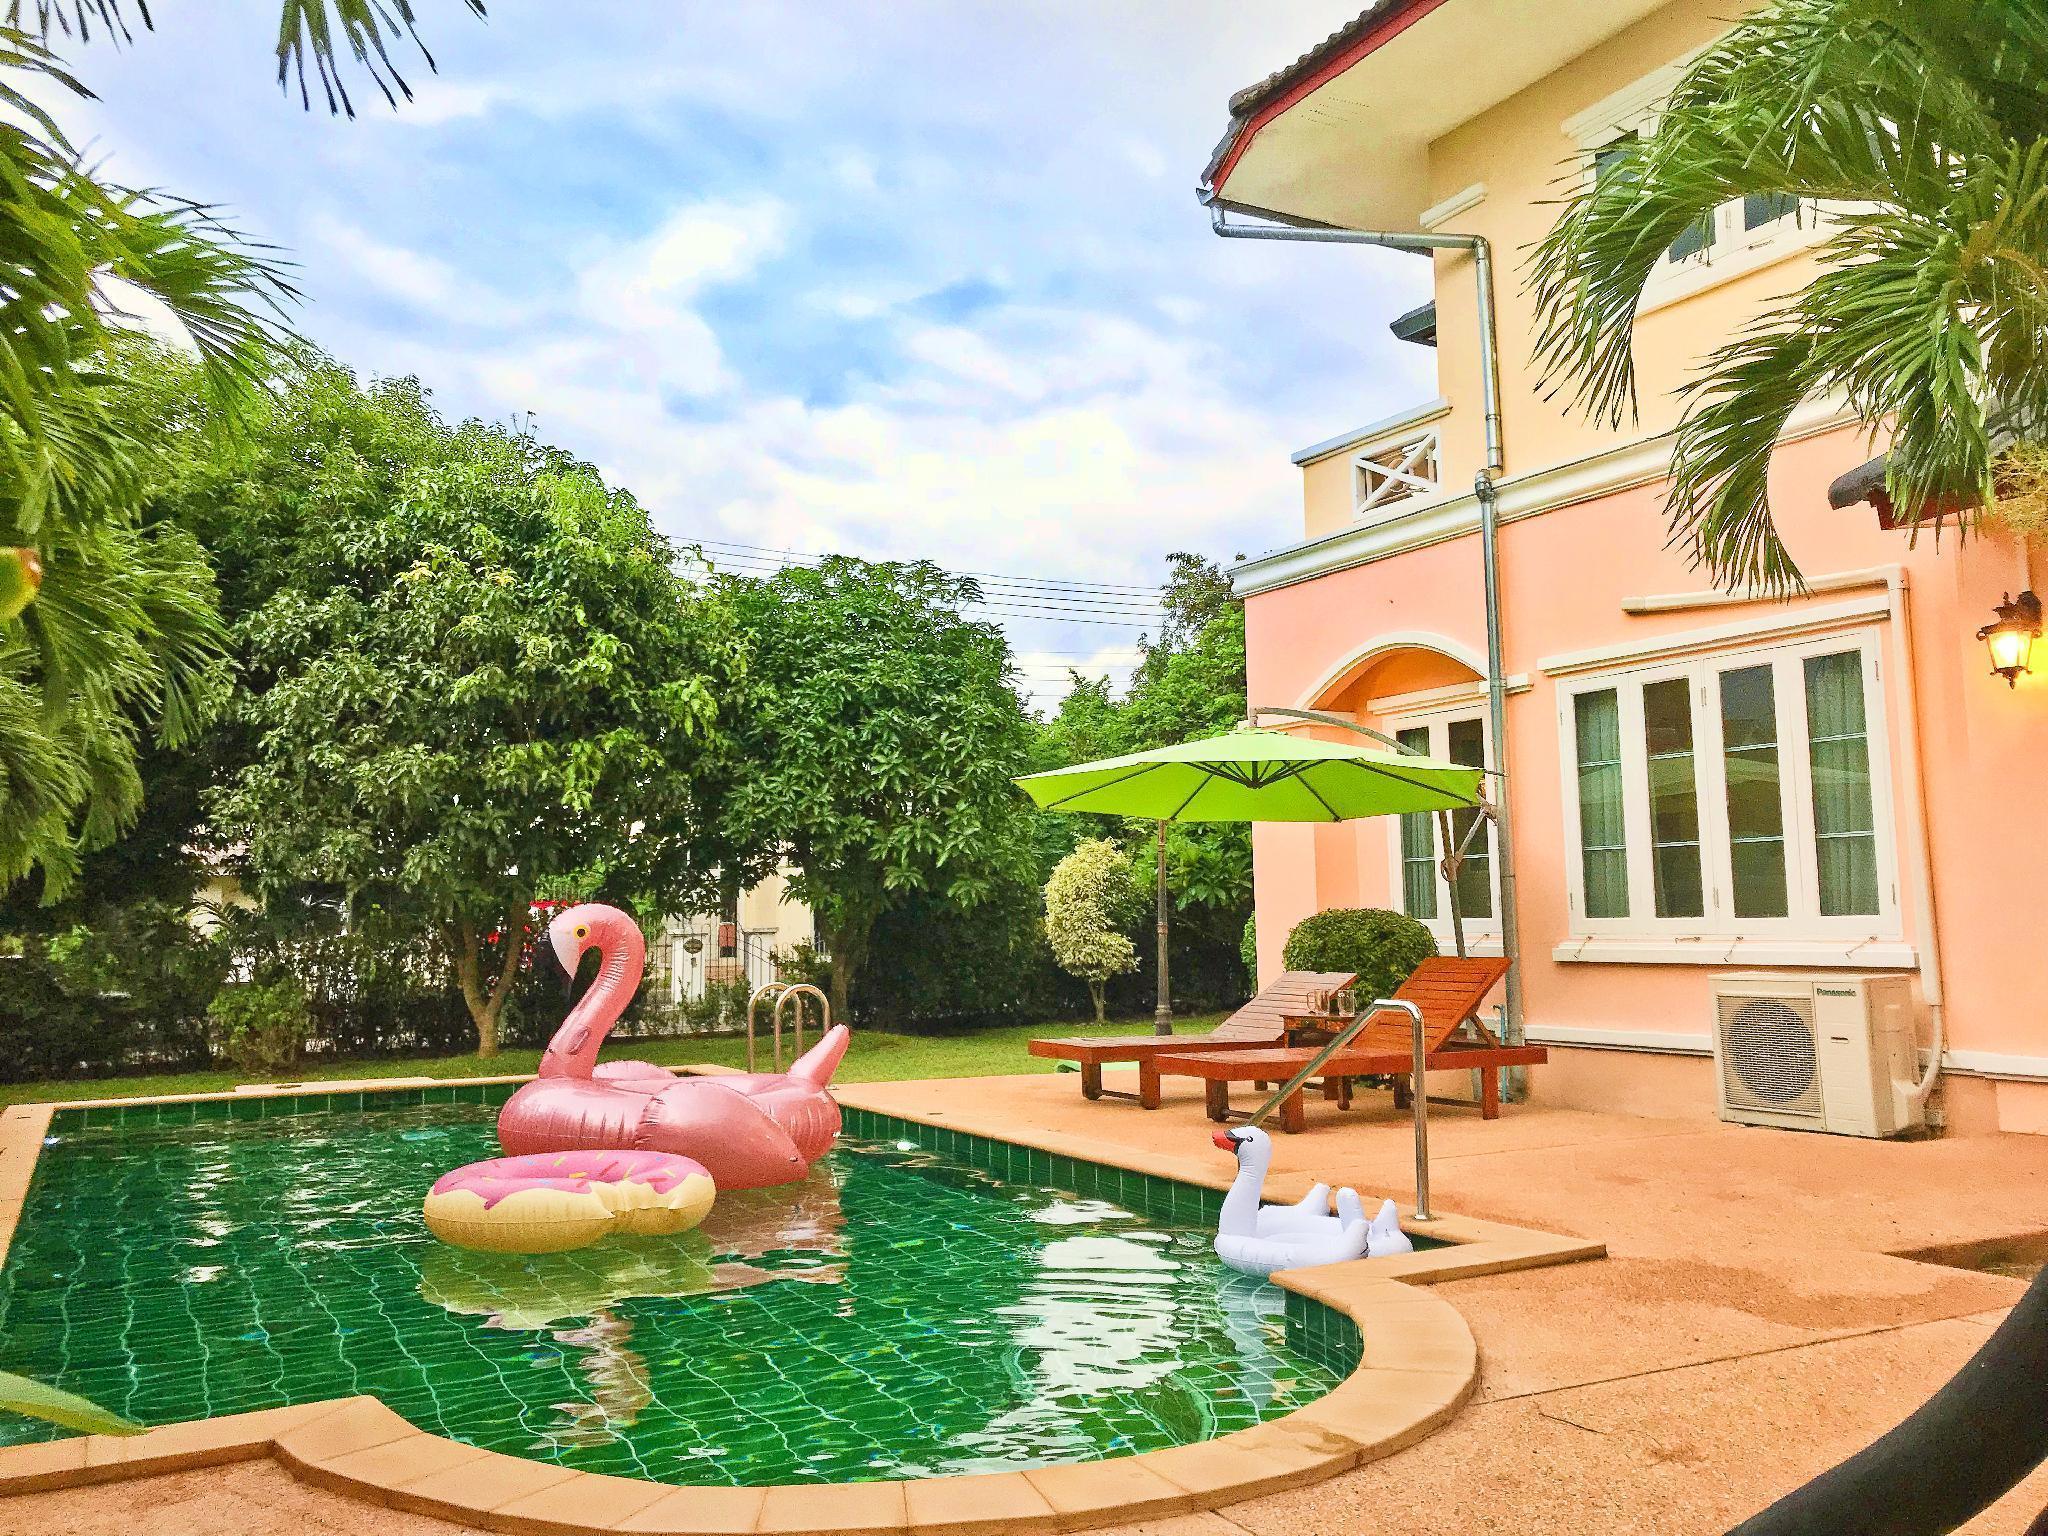 Sunny Pool Villa Chiangmai Sunny Pool Villa Chiangmai